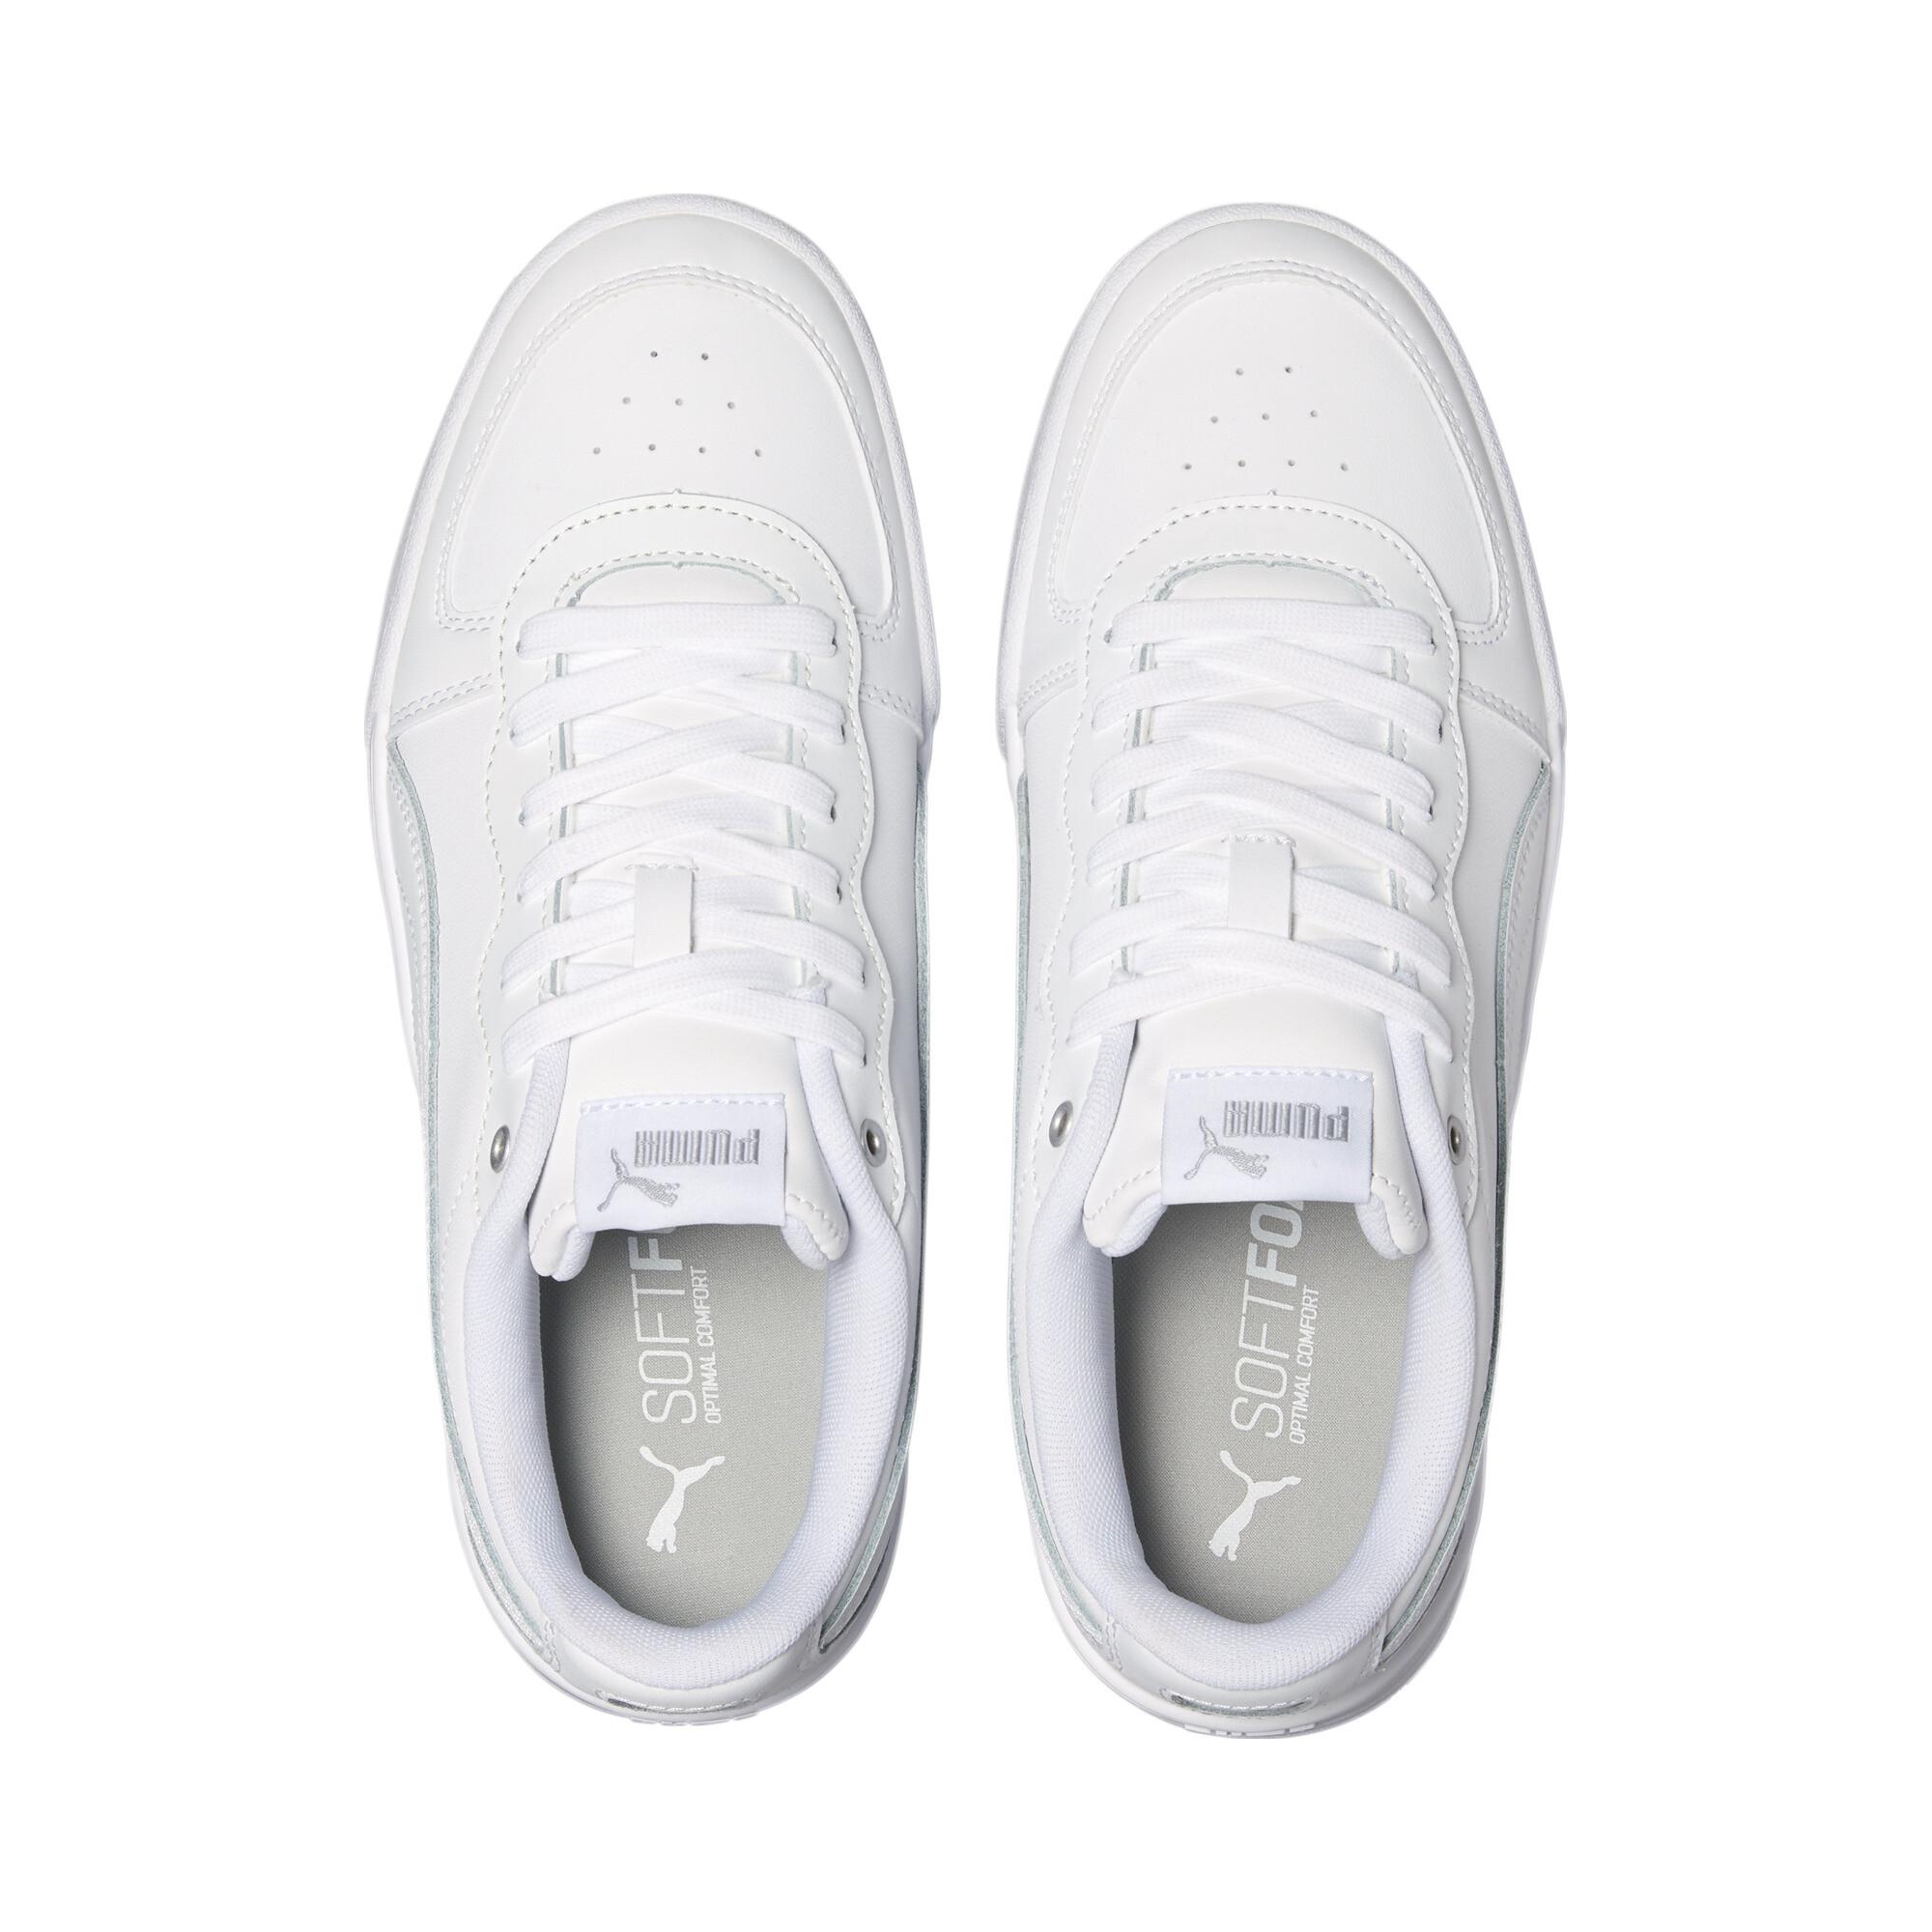 PUMA-Women-039-s-Skye-Sneakers thumbnail 19